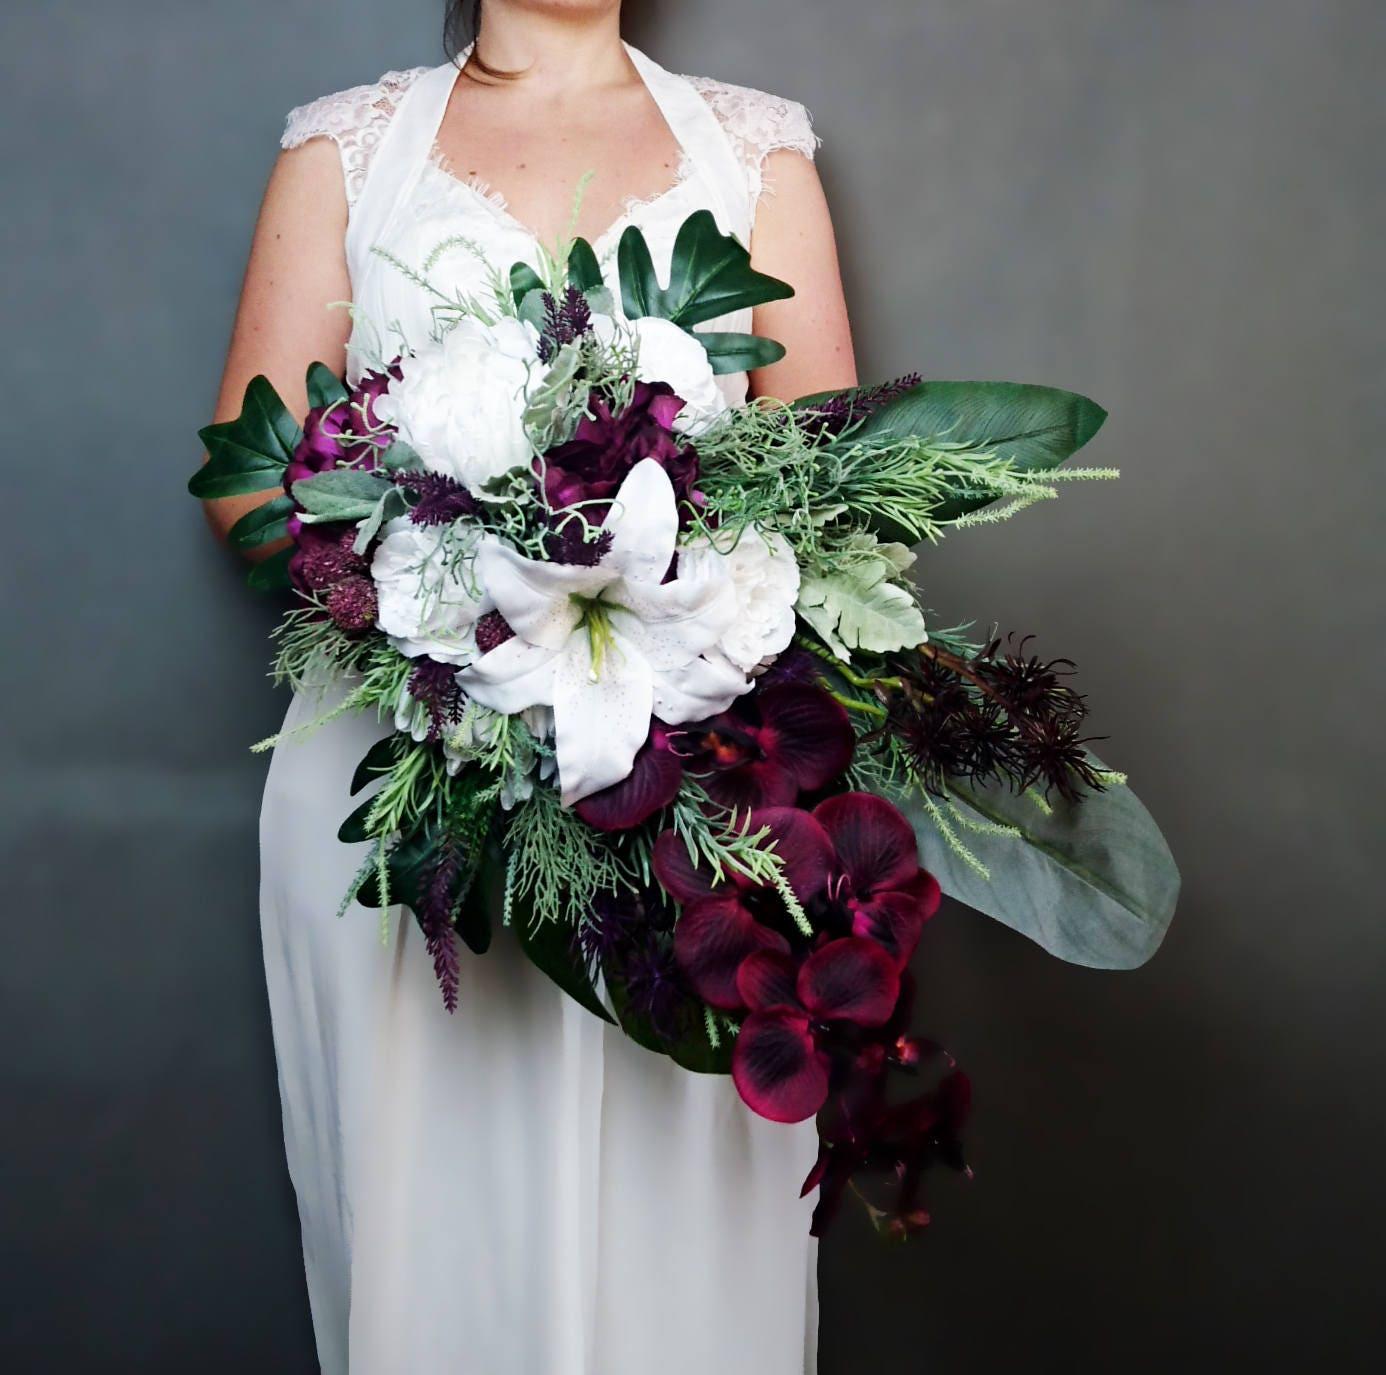 Plum Purple White Tropical Flowers Winter Wedding Bridal Bouquet